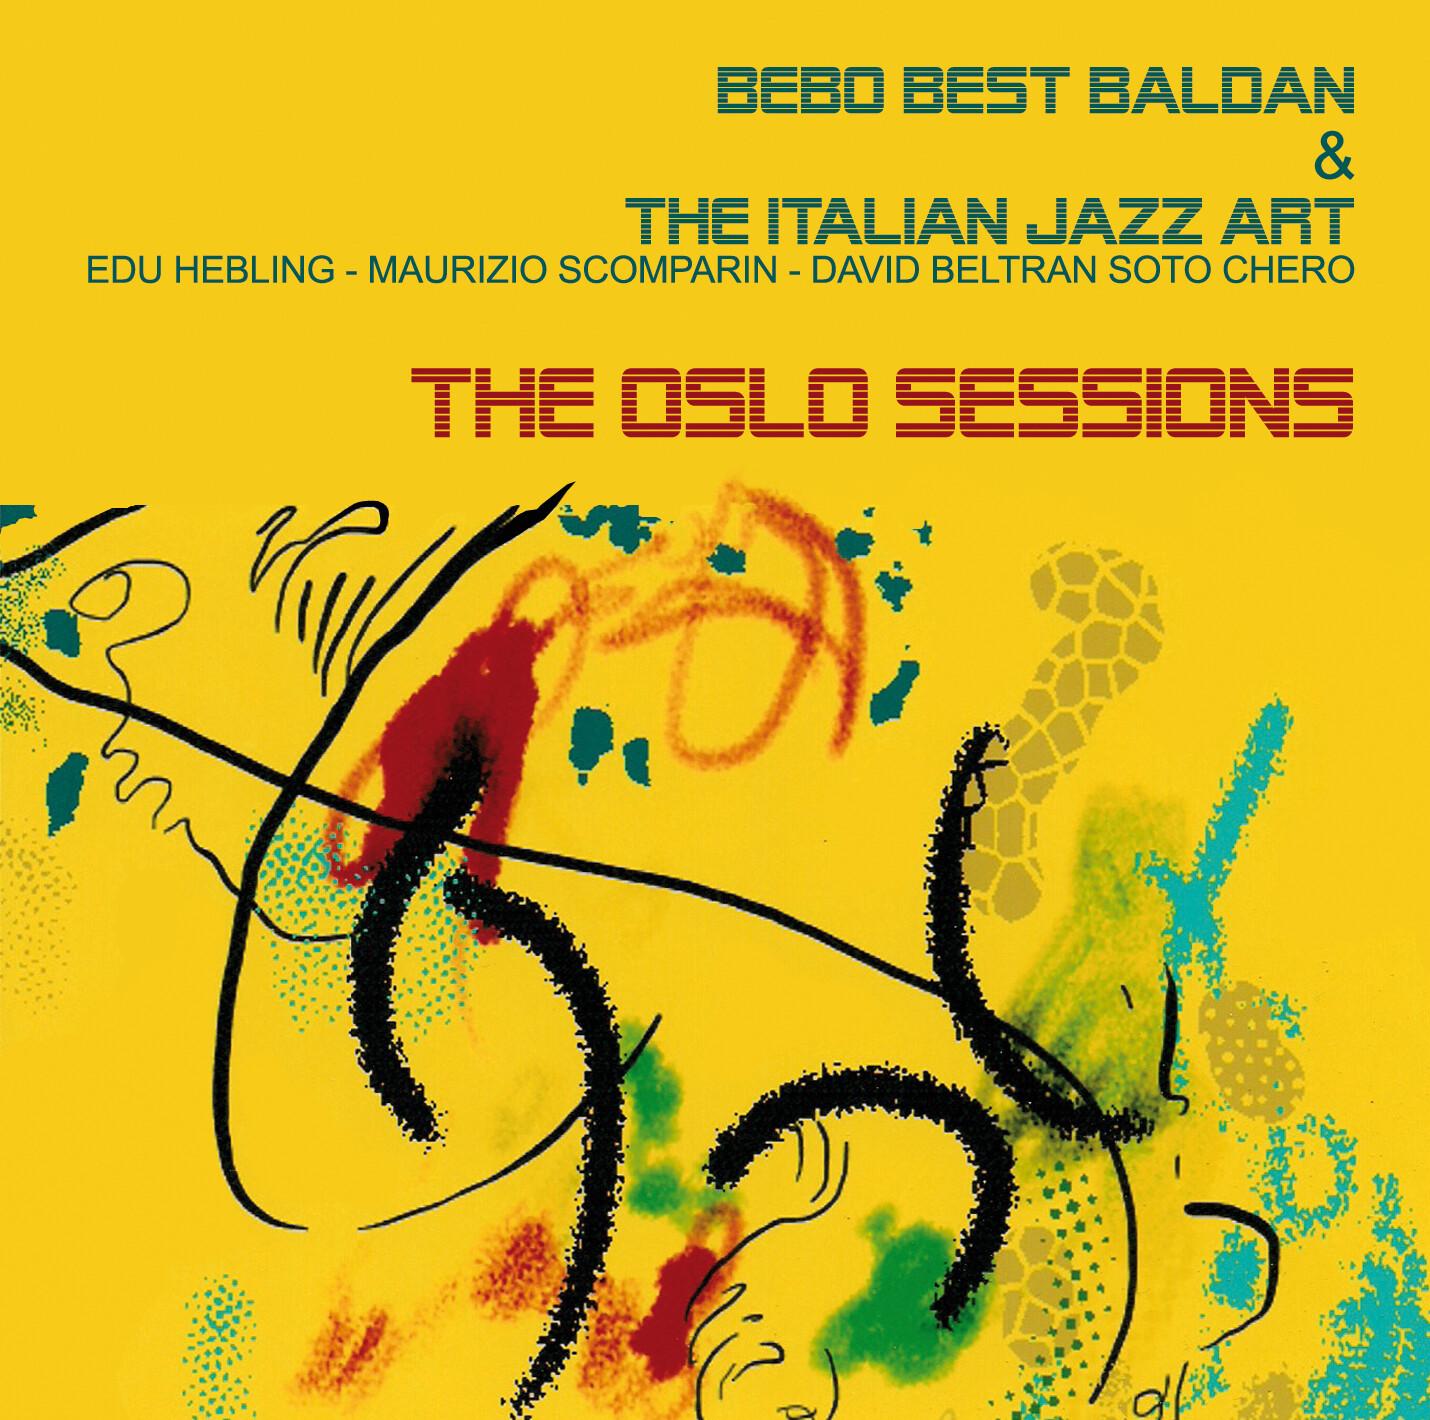 BEBO BEST BALDAN & THE ITALIAN JAZZ ART  «The Oslo sessions»